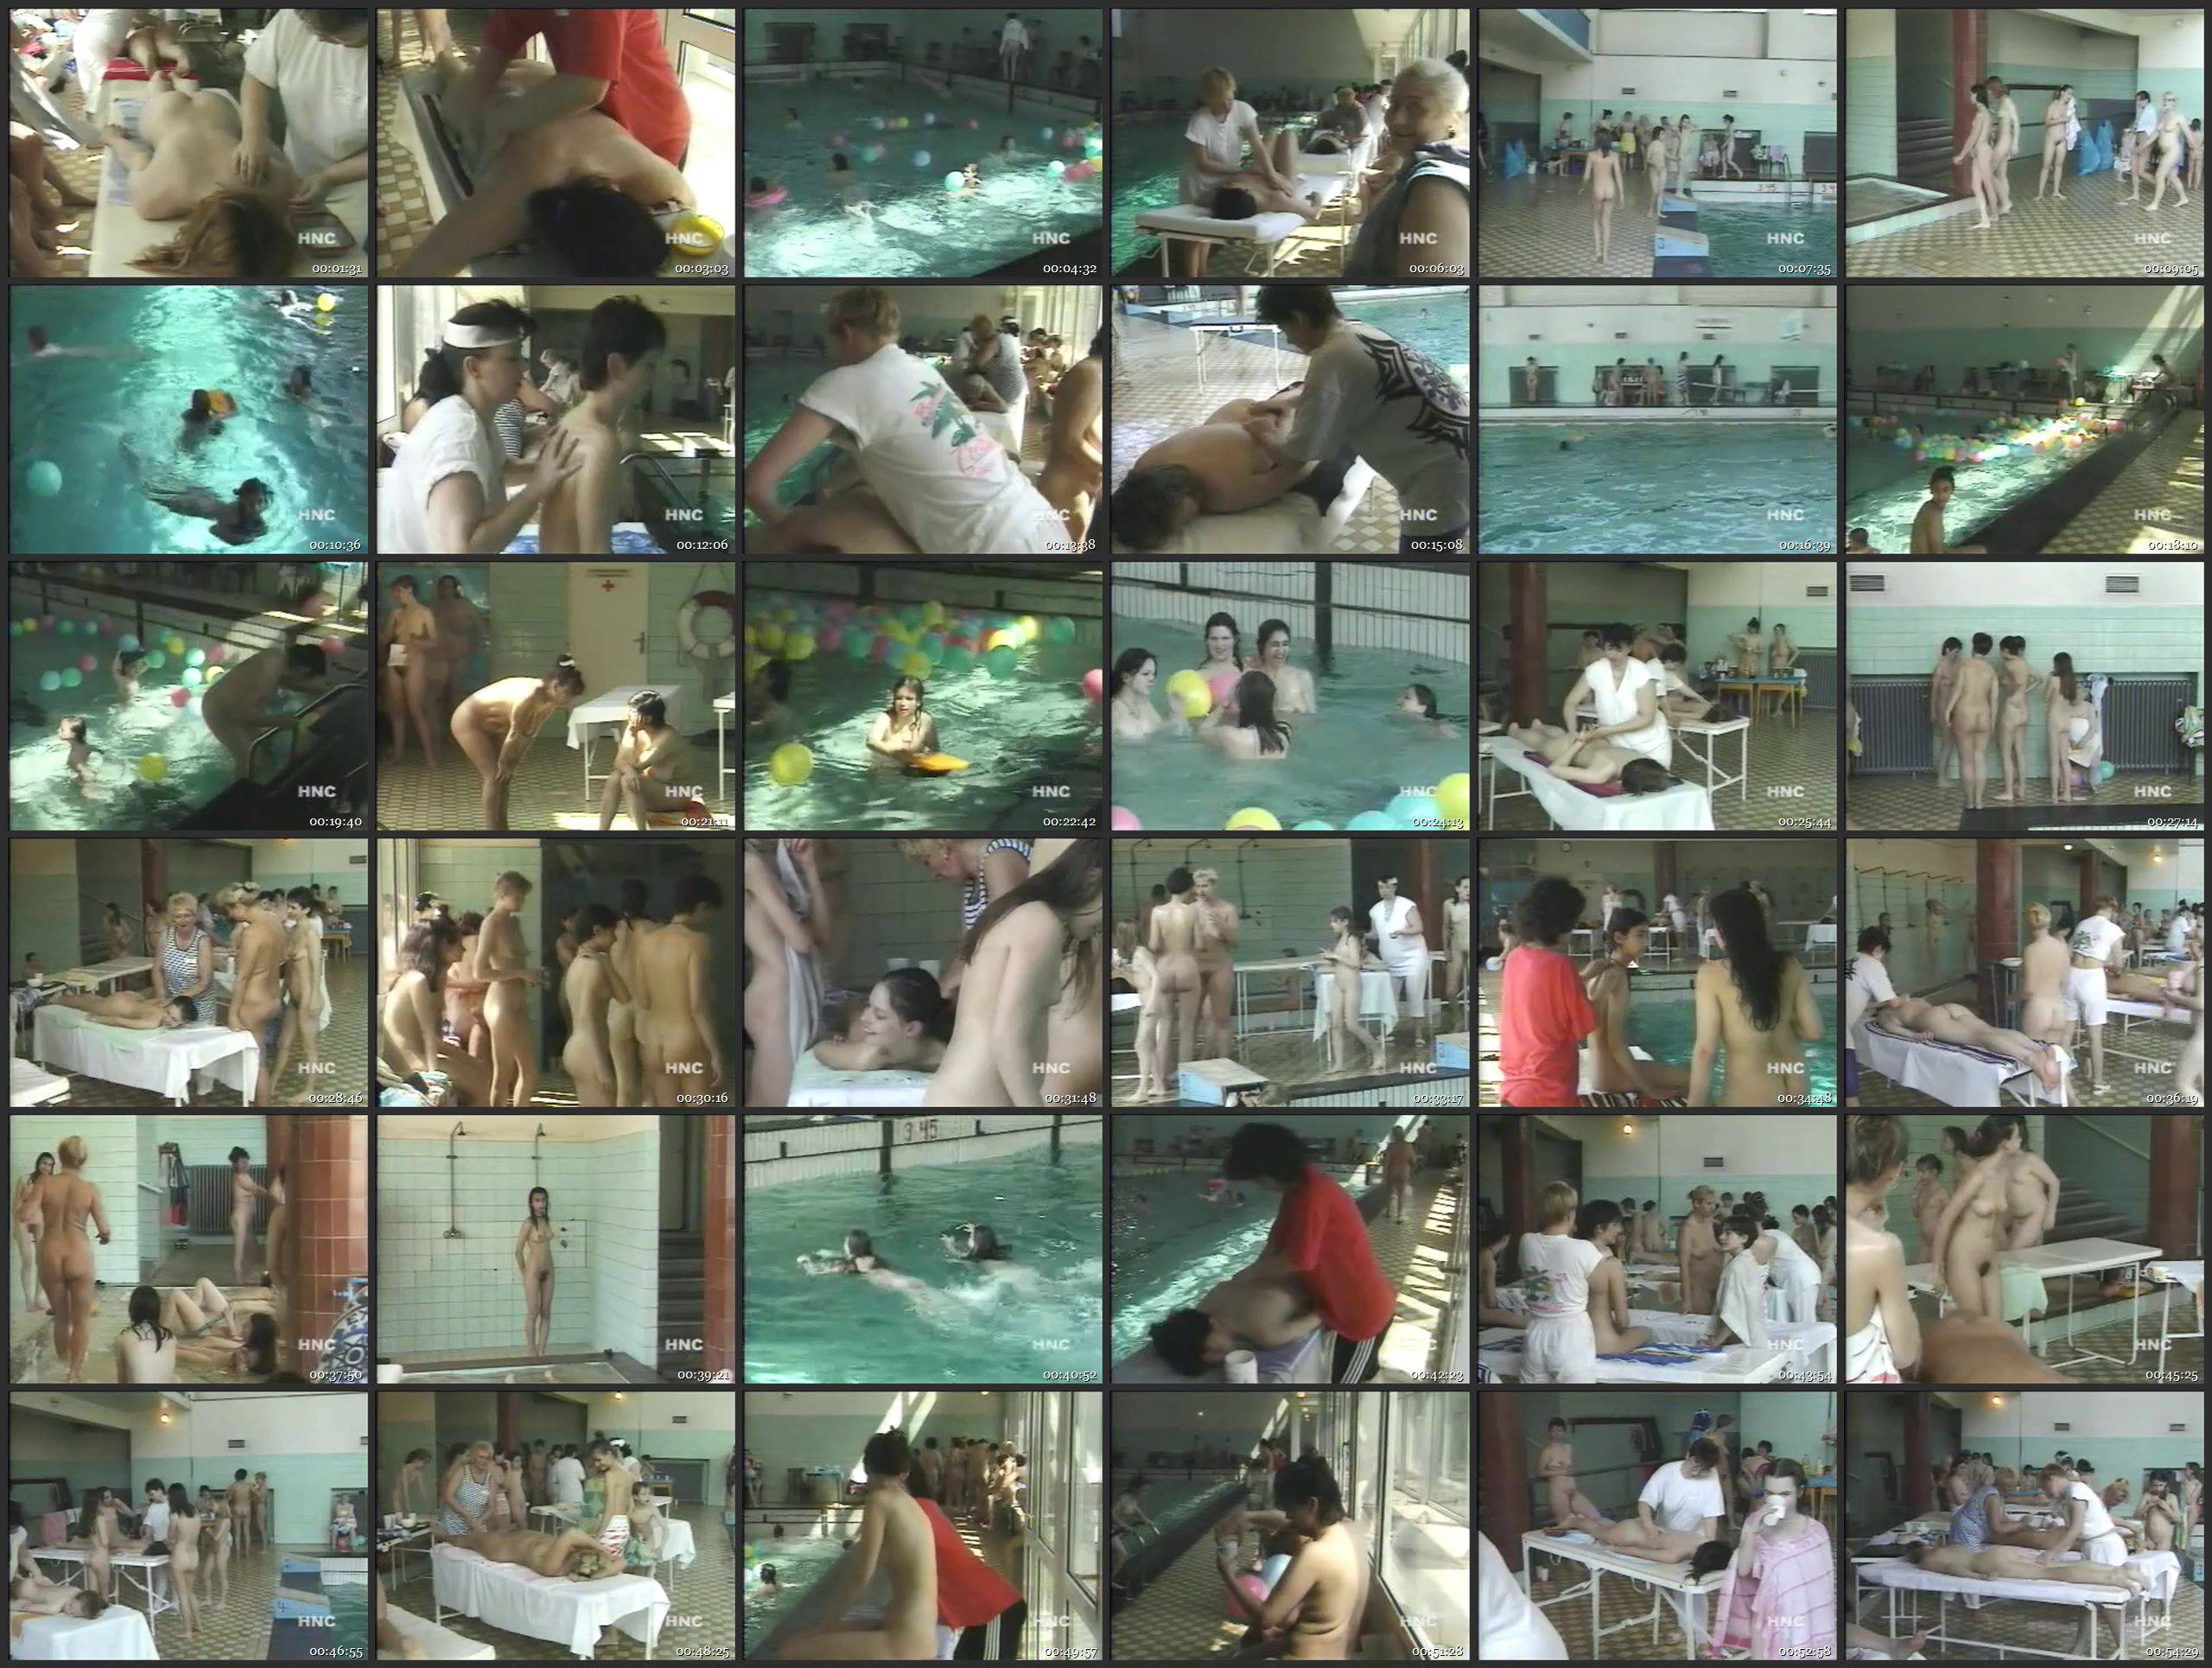 NaturistGuide.com-Nudist Massage for Women - Thumbnails